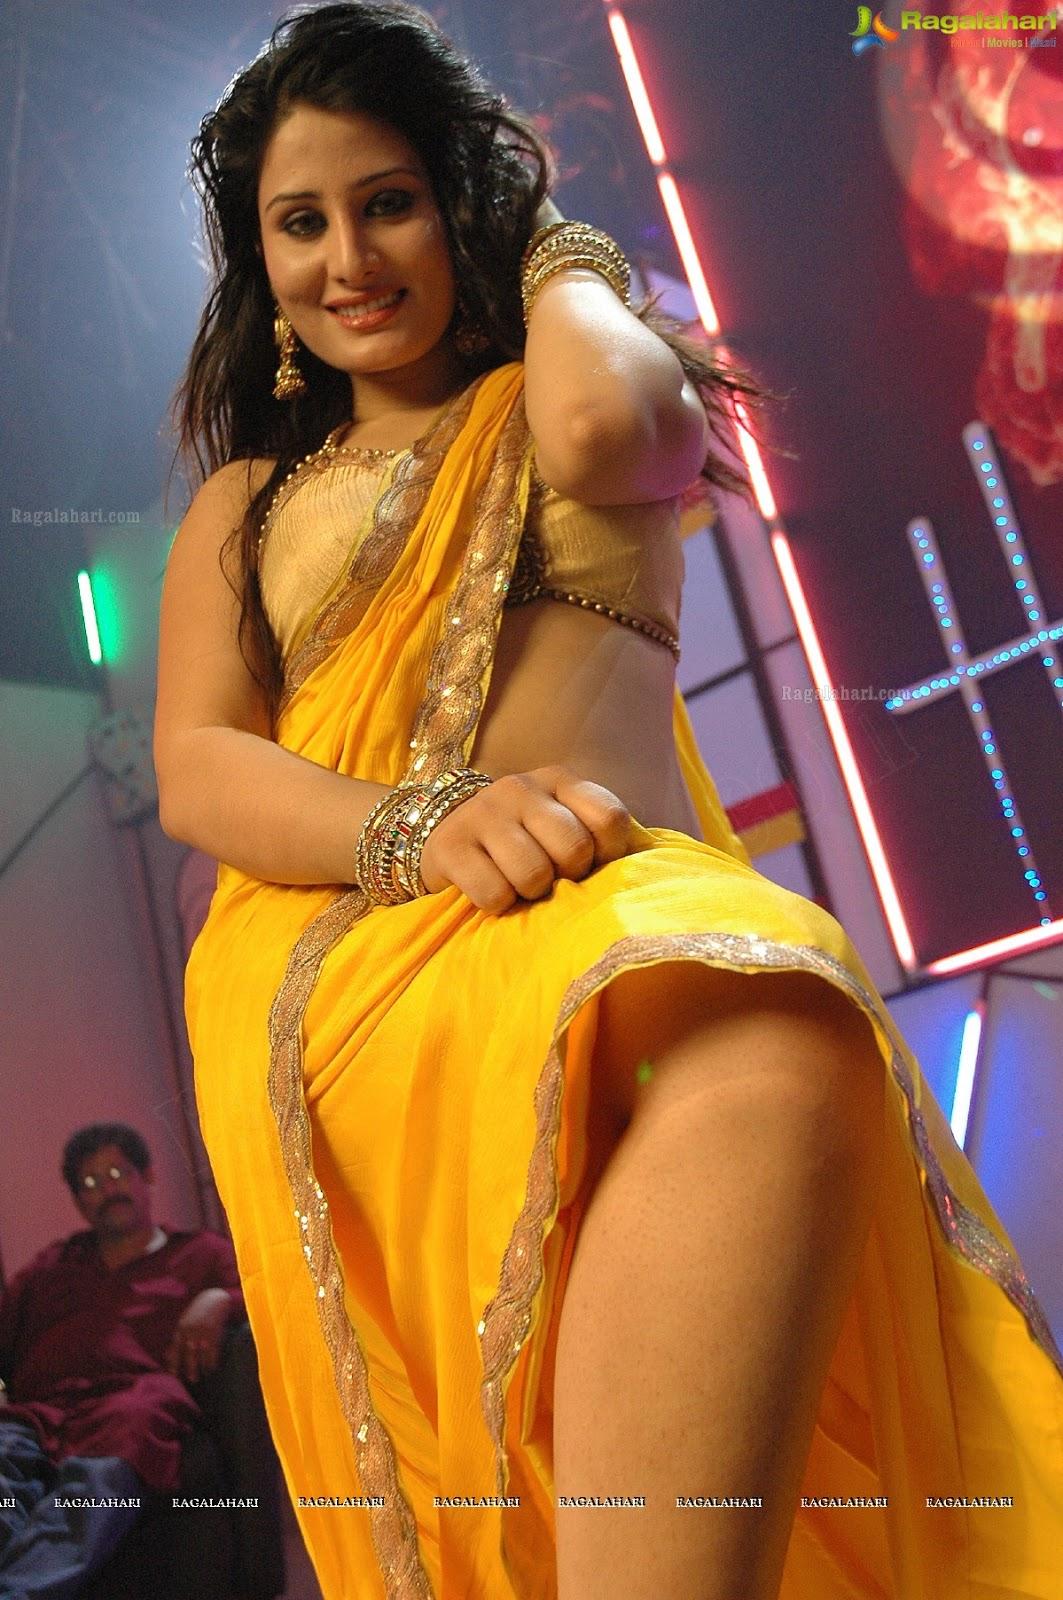 Actress hot in saree must watch enjoy weekend page 4 movie teluguactressajjuhotnavelandcleava altavistaventures Gallery